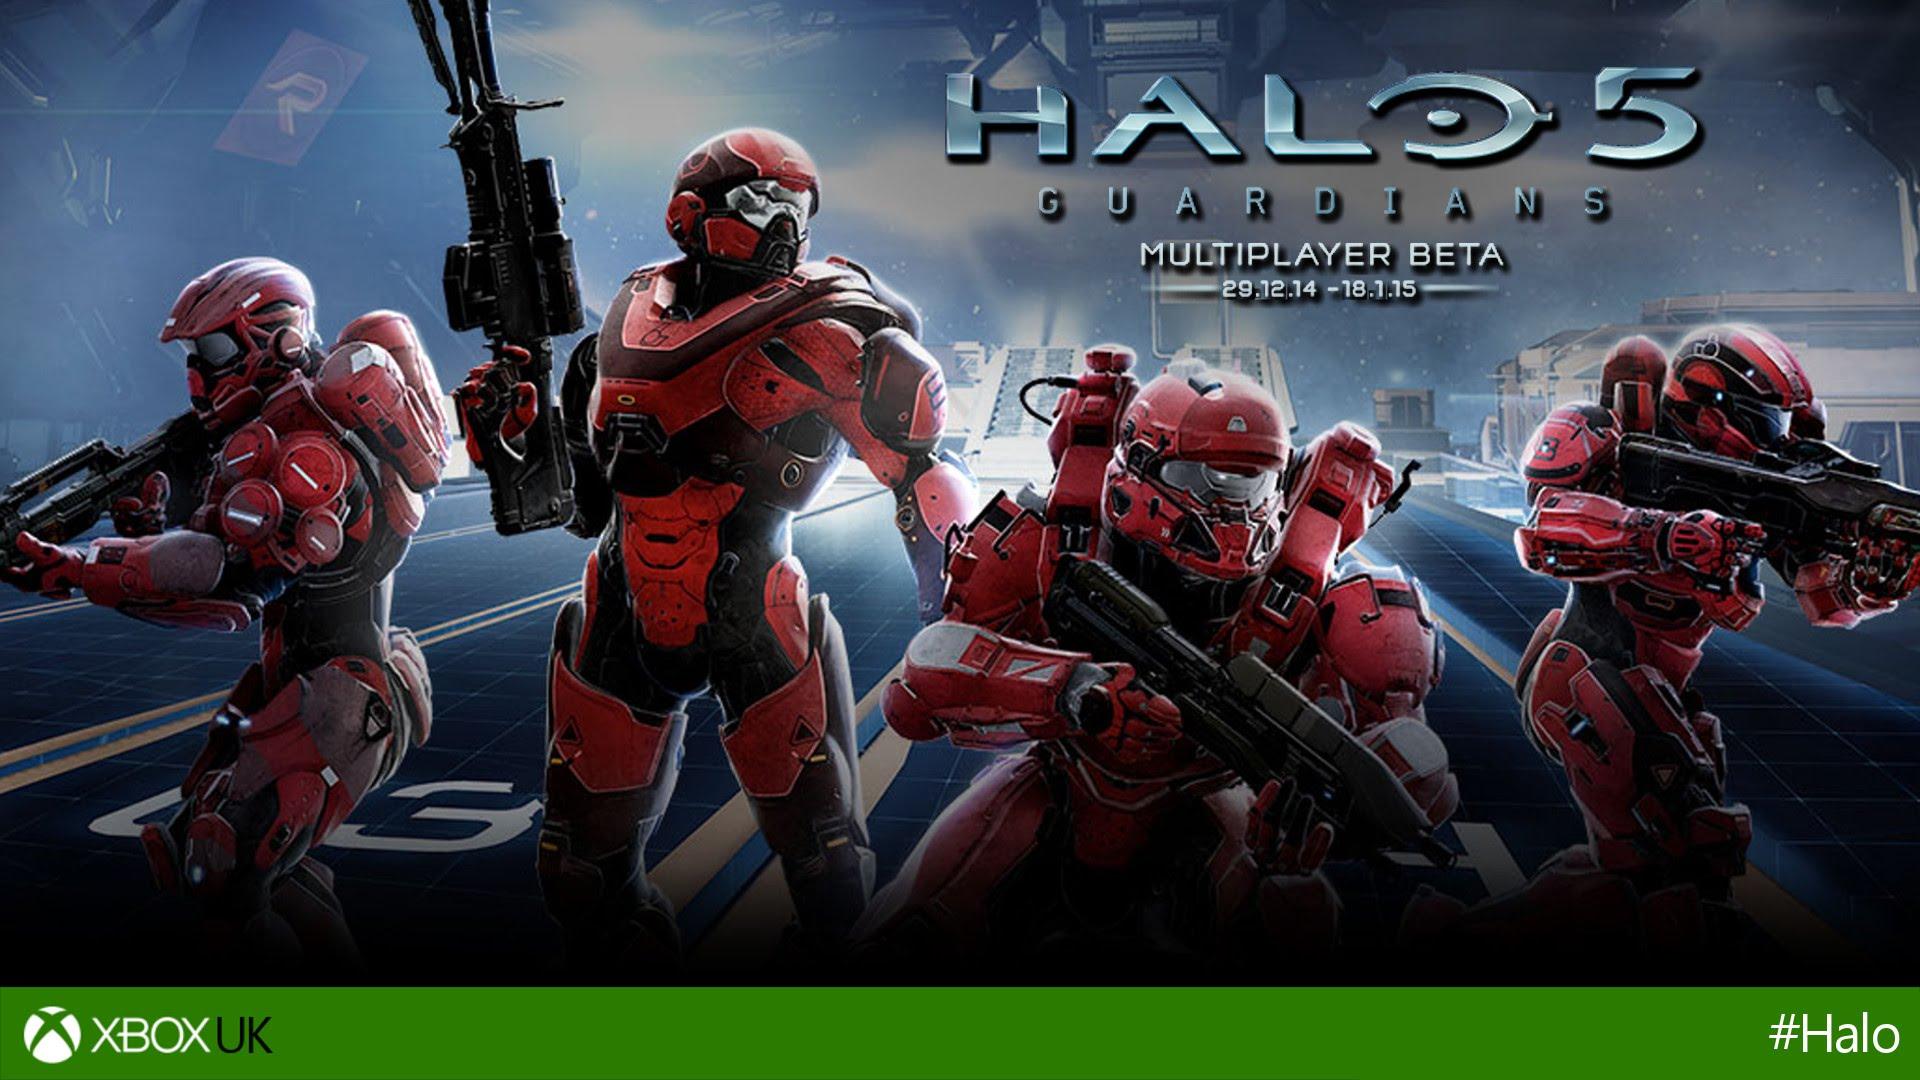 Halo 5: Guardians - Multiplayer Beta Trailer - FPS Prestige